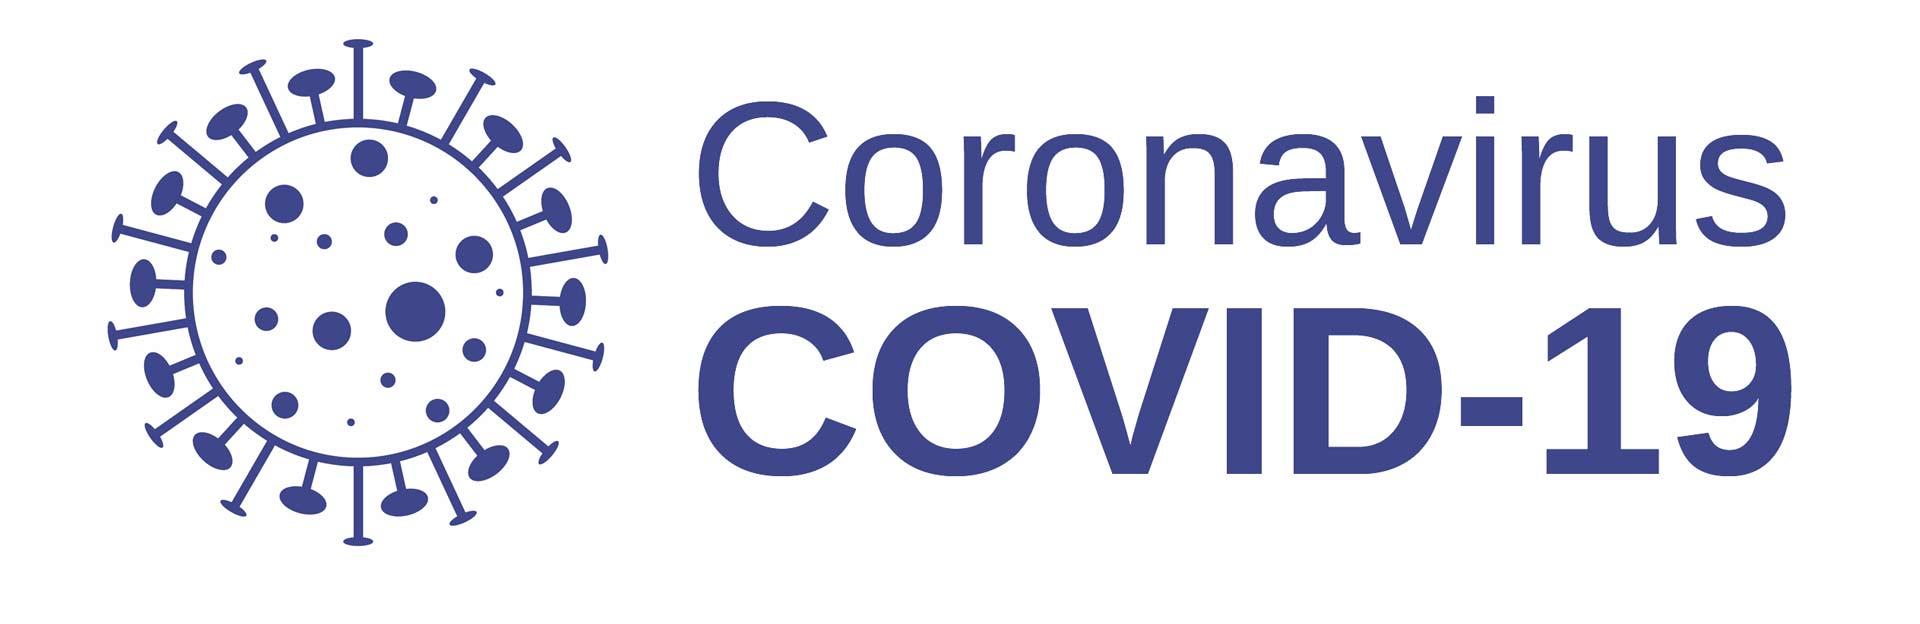 Coronavirus Luftbrücke - gestrandet im Ausland